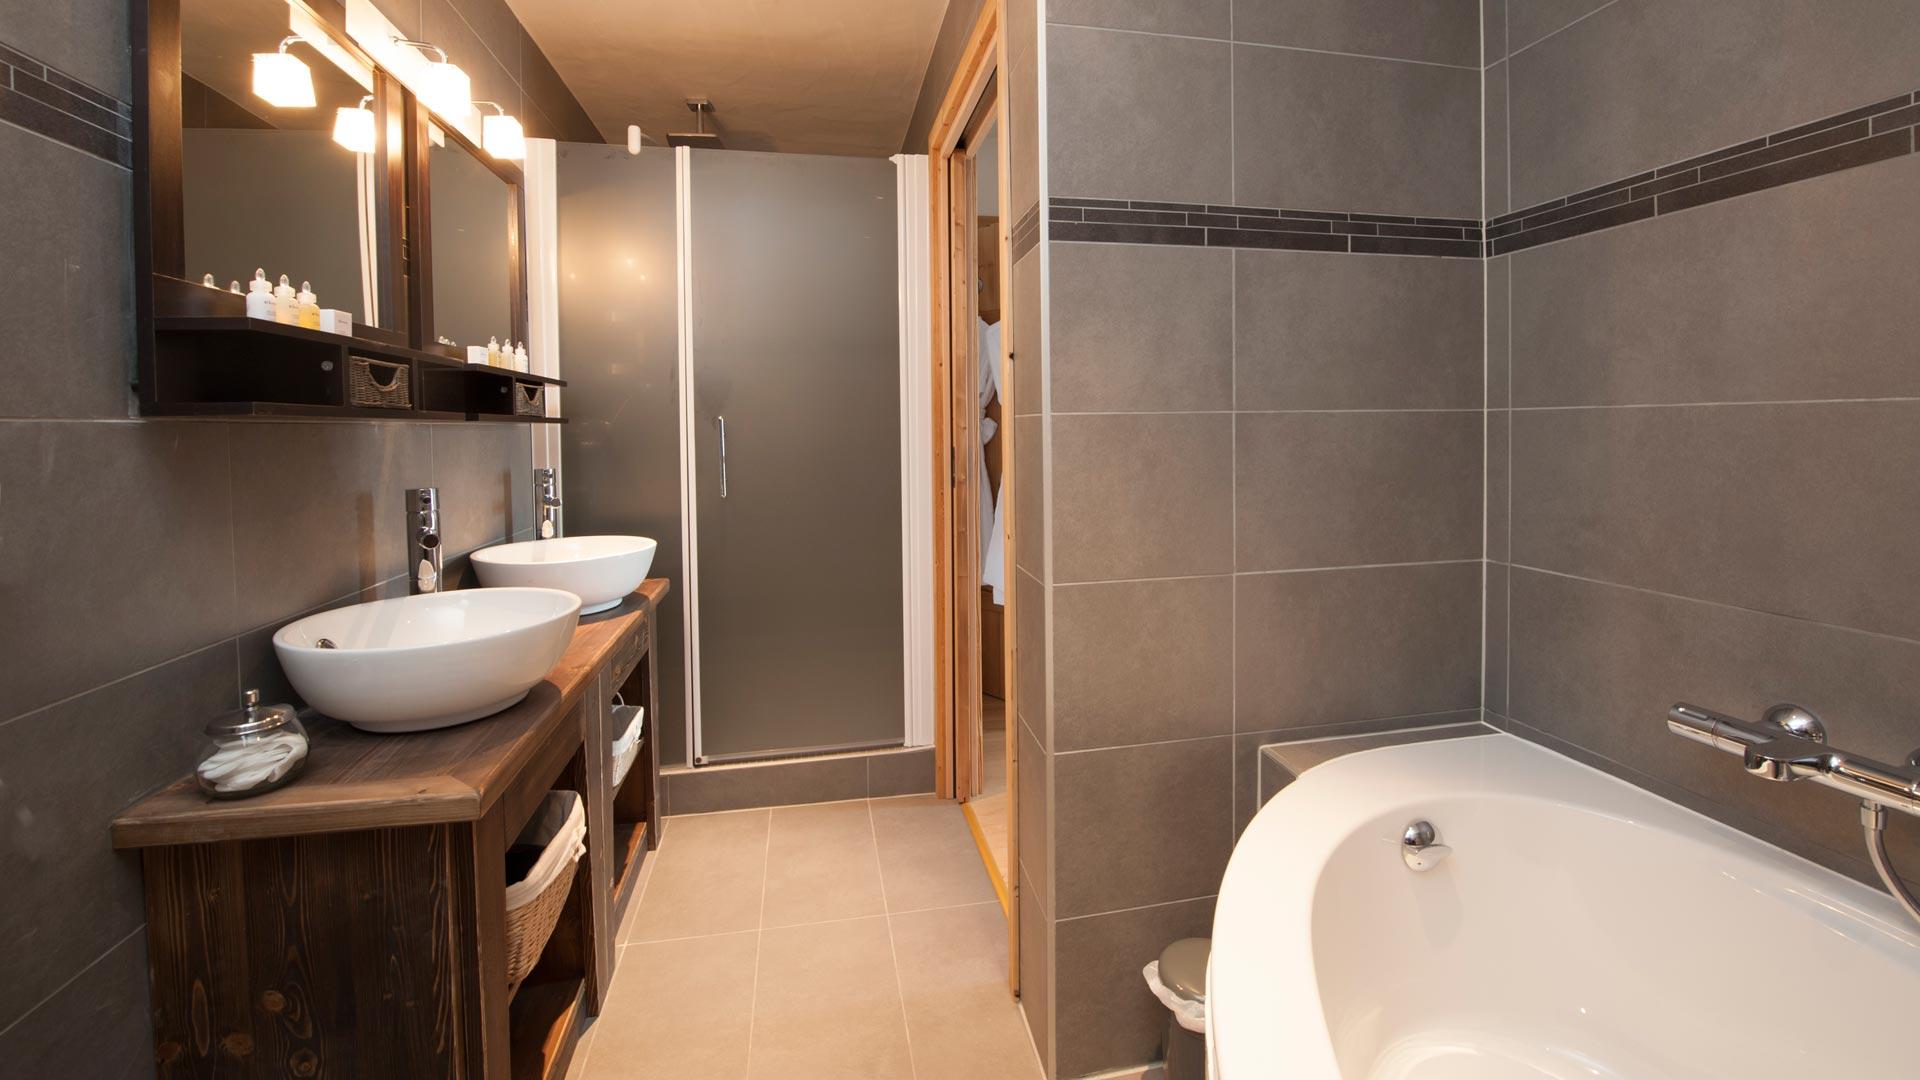 Ensuite Bathroom in La Marquise Chalet in Ste Foy